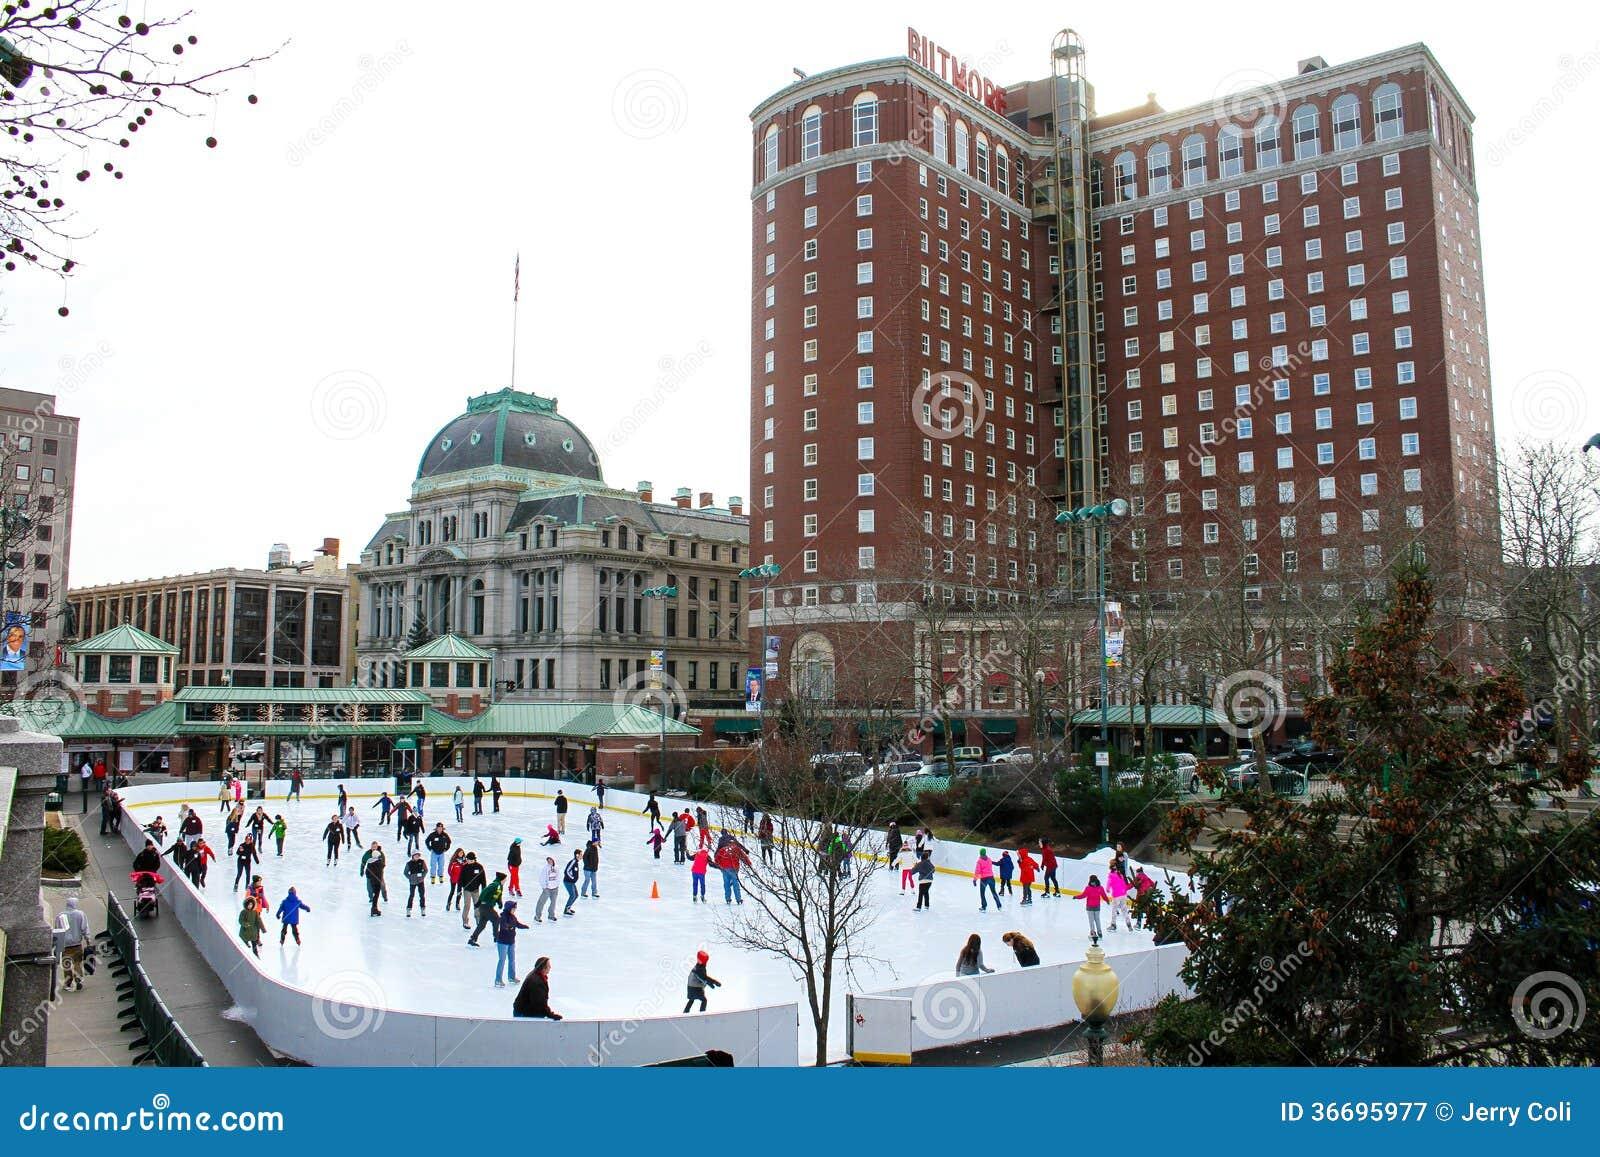 Providence Rhode Island Skating Rink